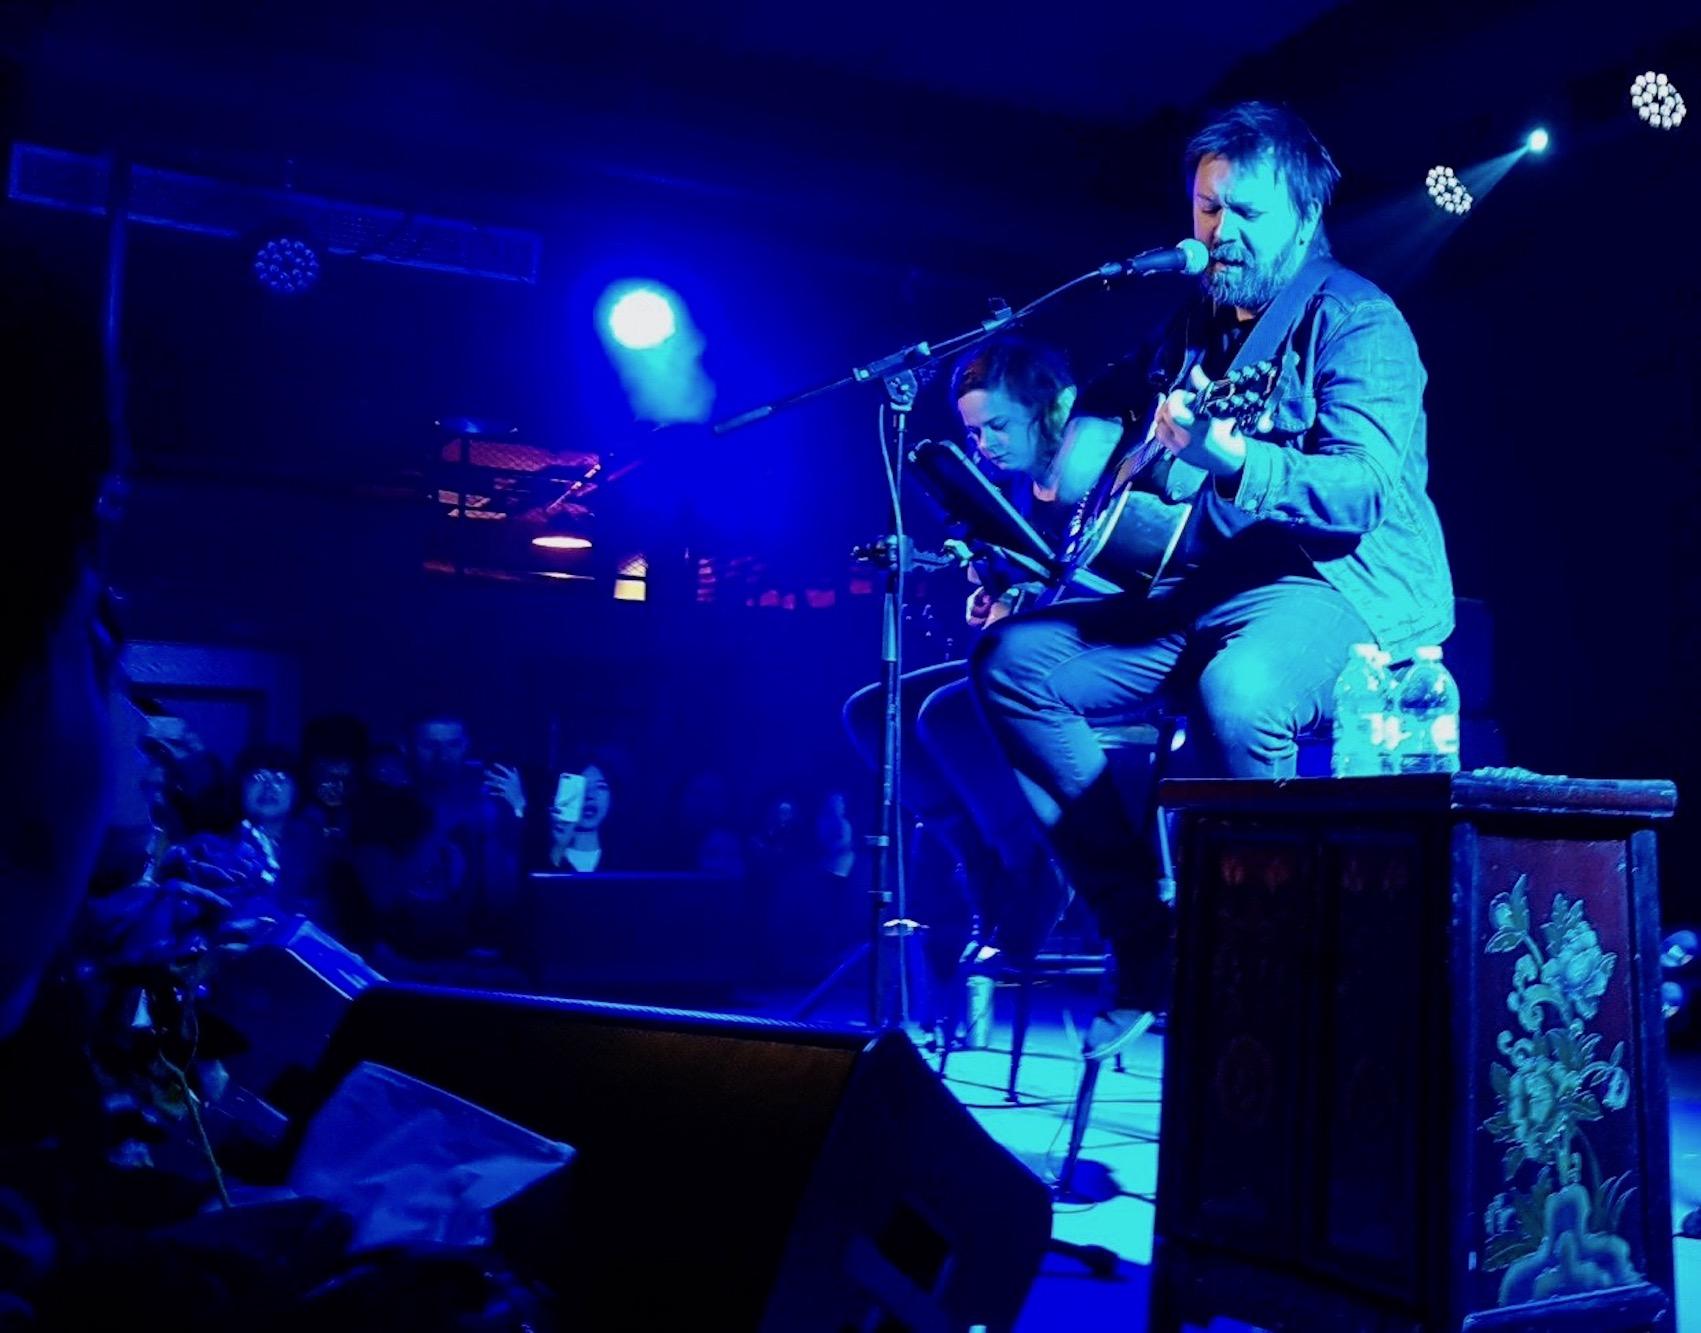 Paul Draper Acoustic live performance Yuyintang Park Shanghai.